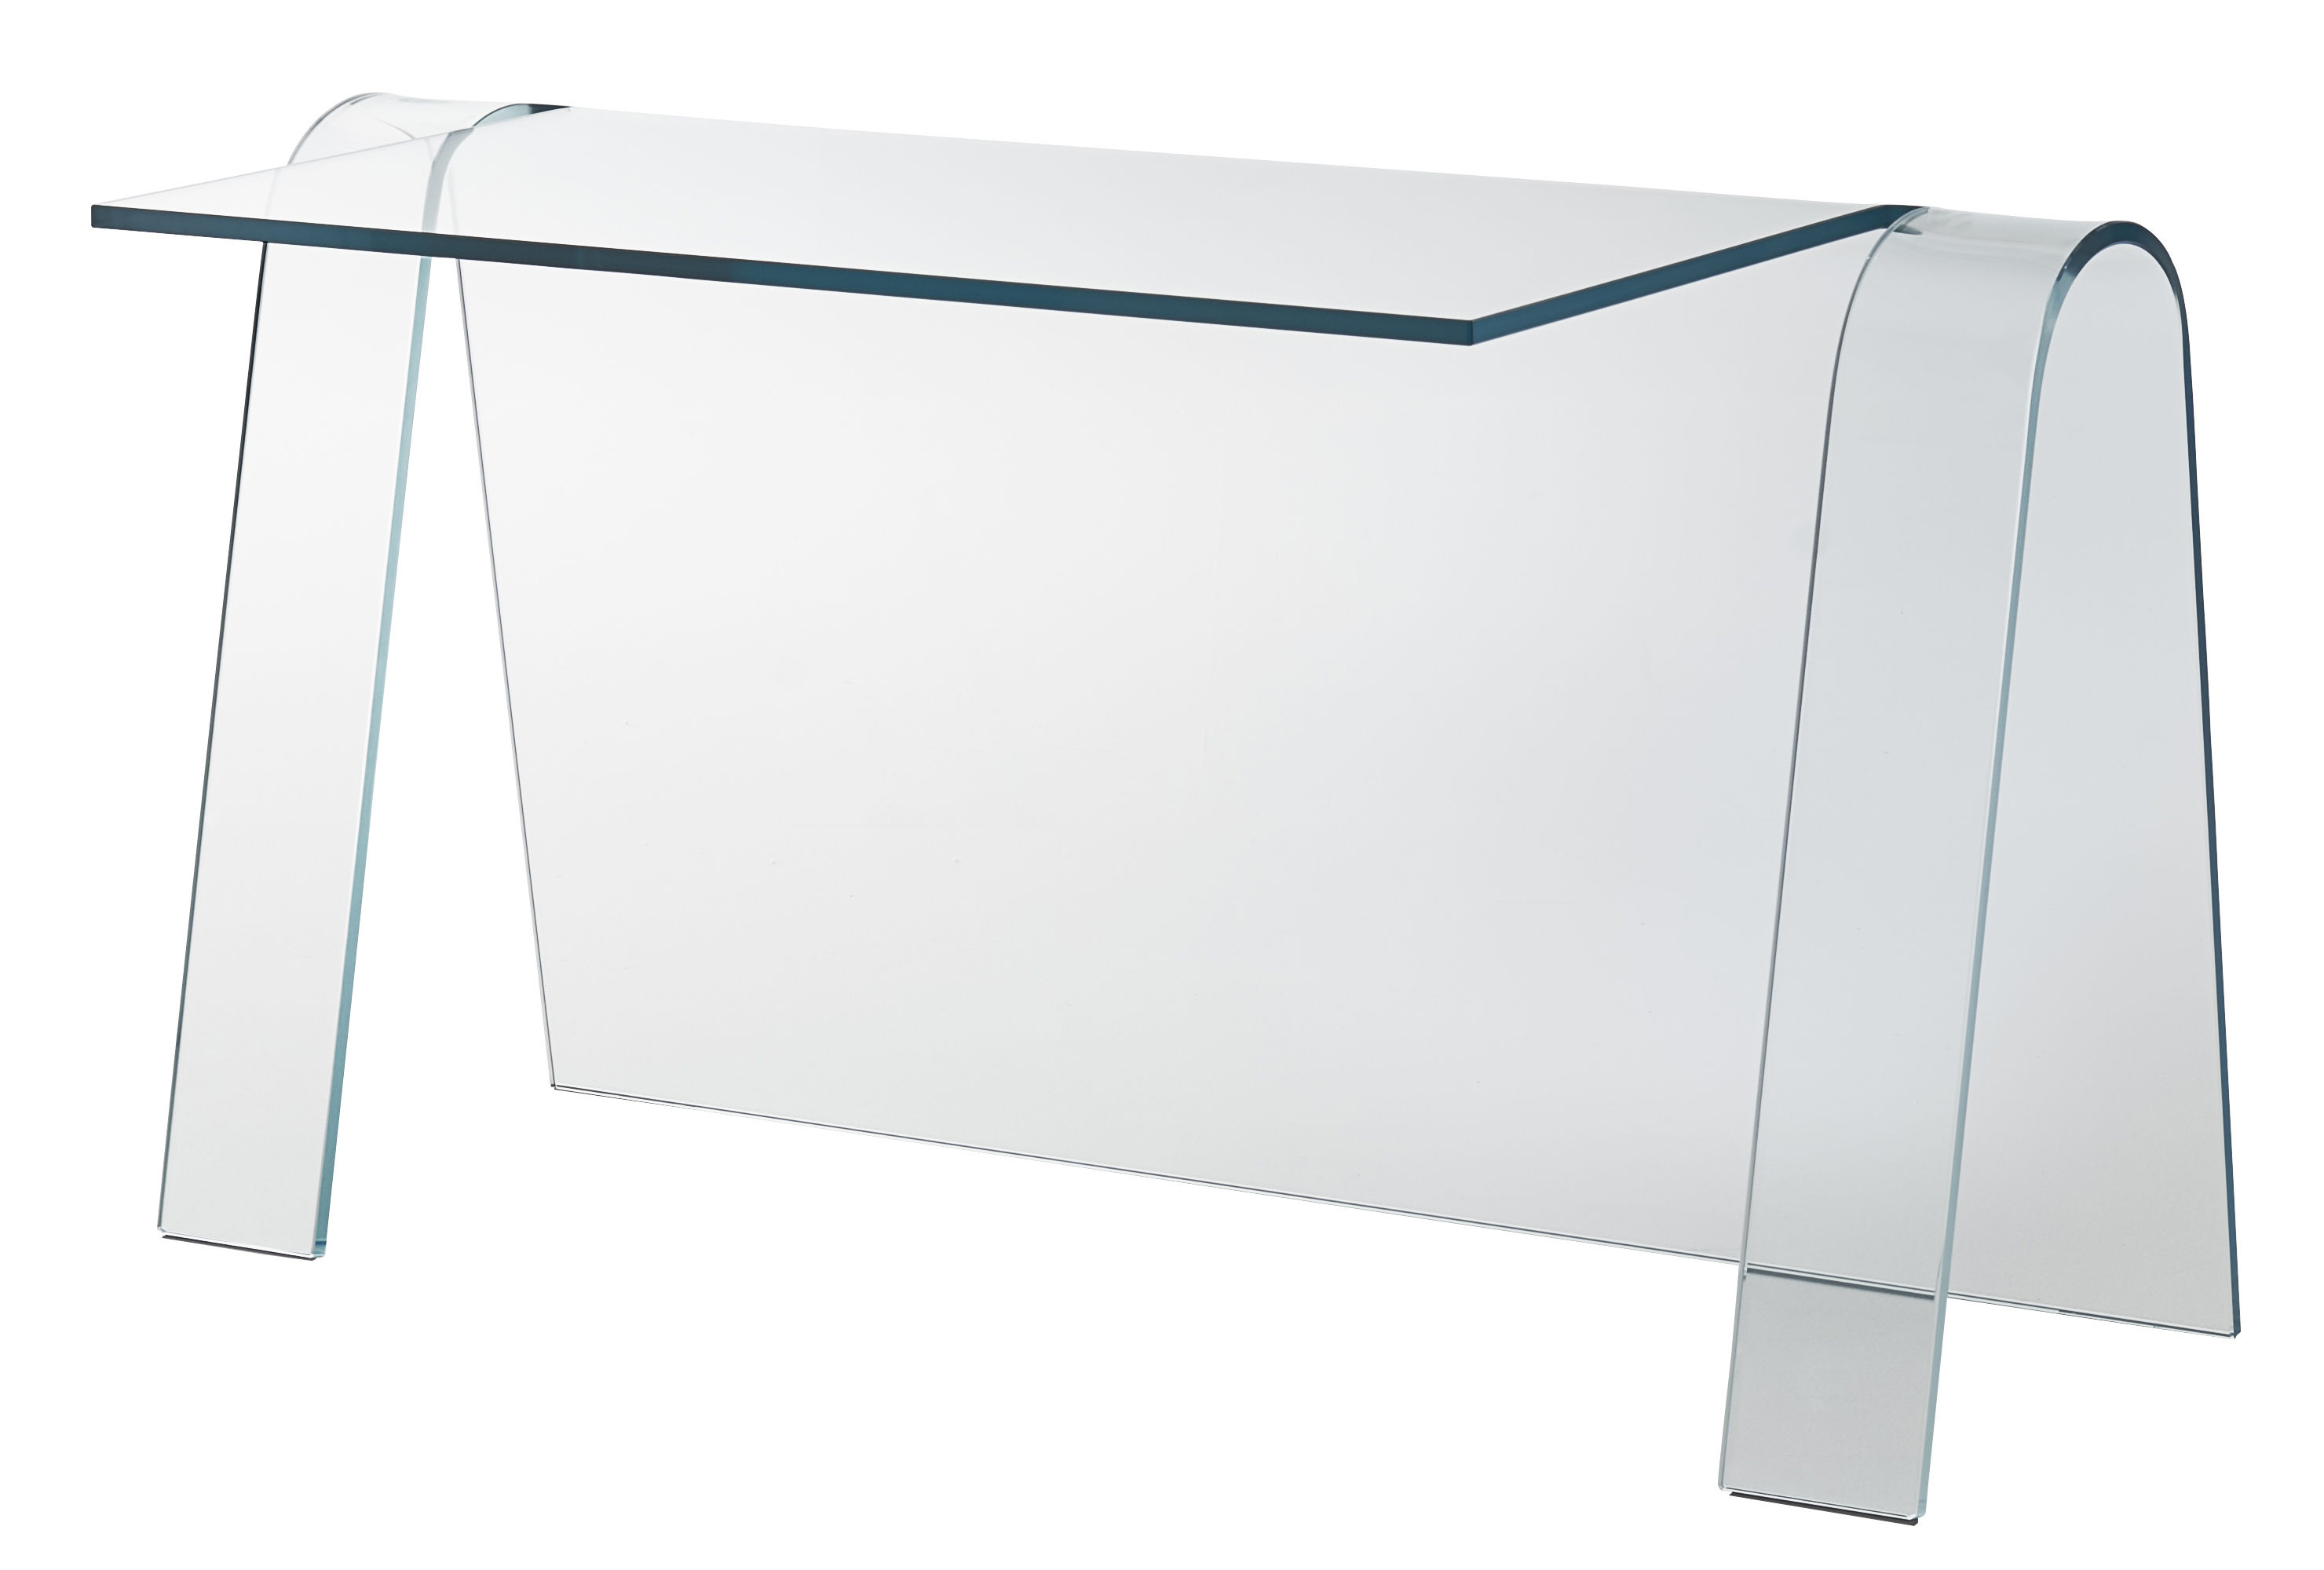 Furniture - Office Furniture - Folio Desk - / Glass - L 133 cm by Glas Italia - Transparent - Extra-clear glass